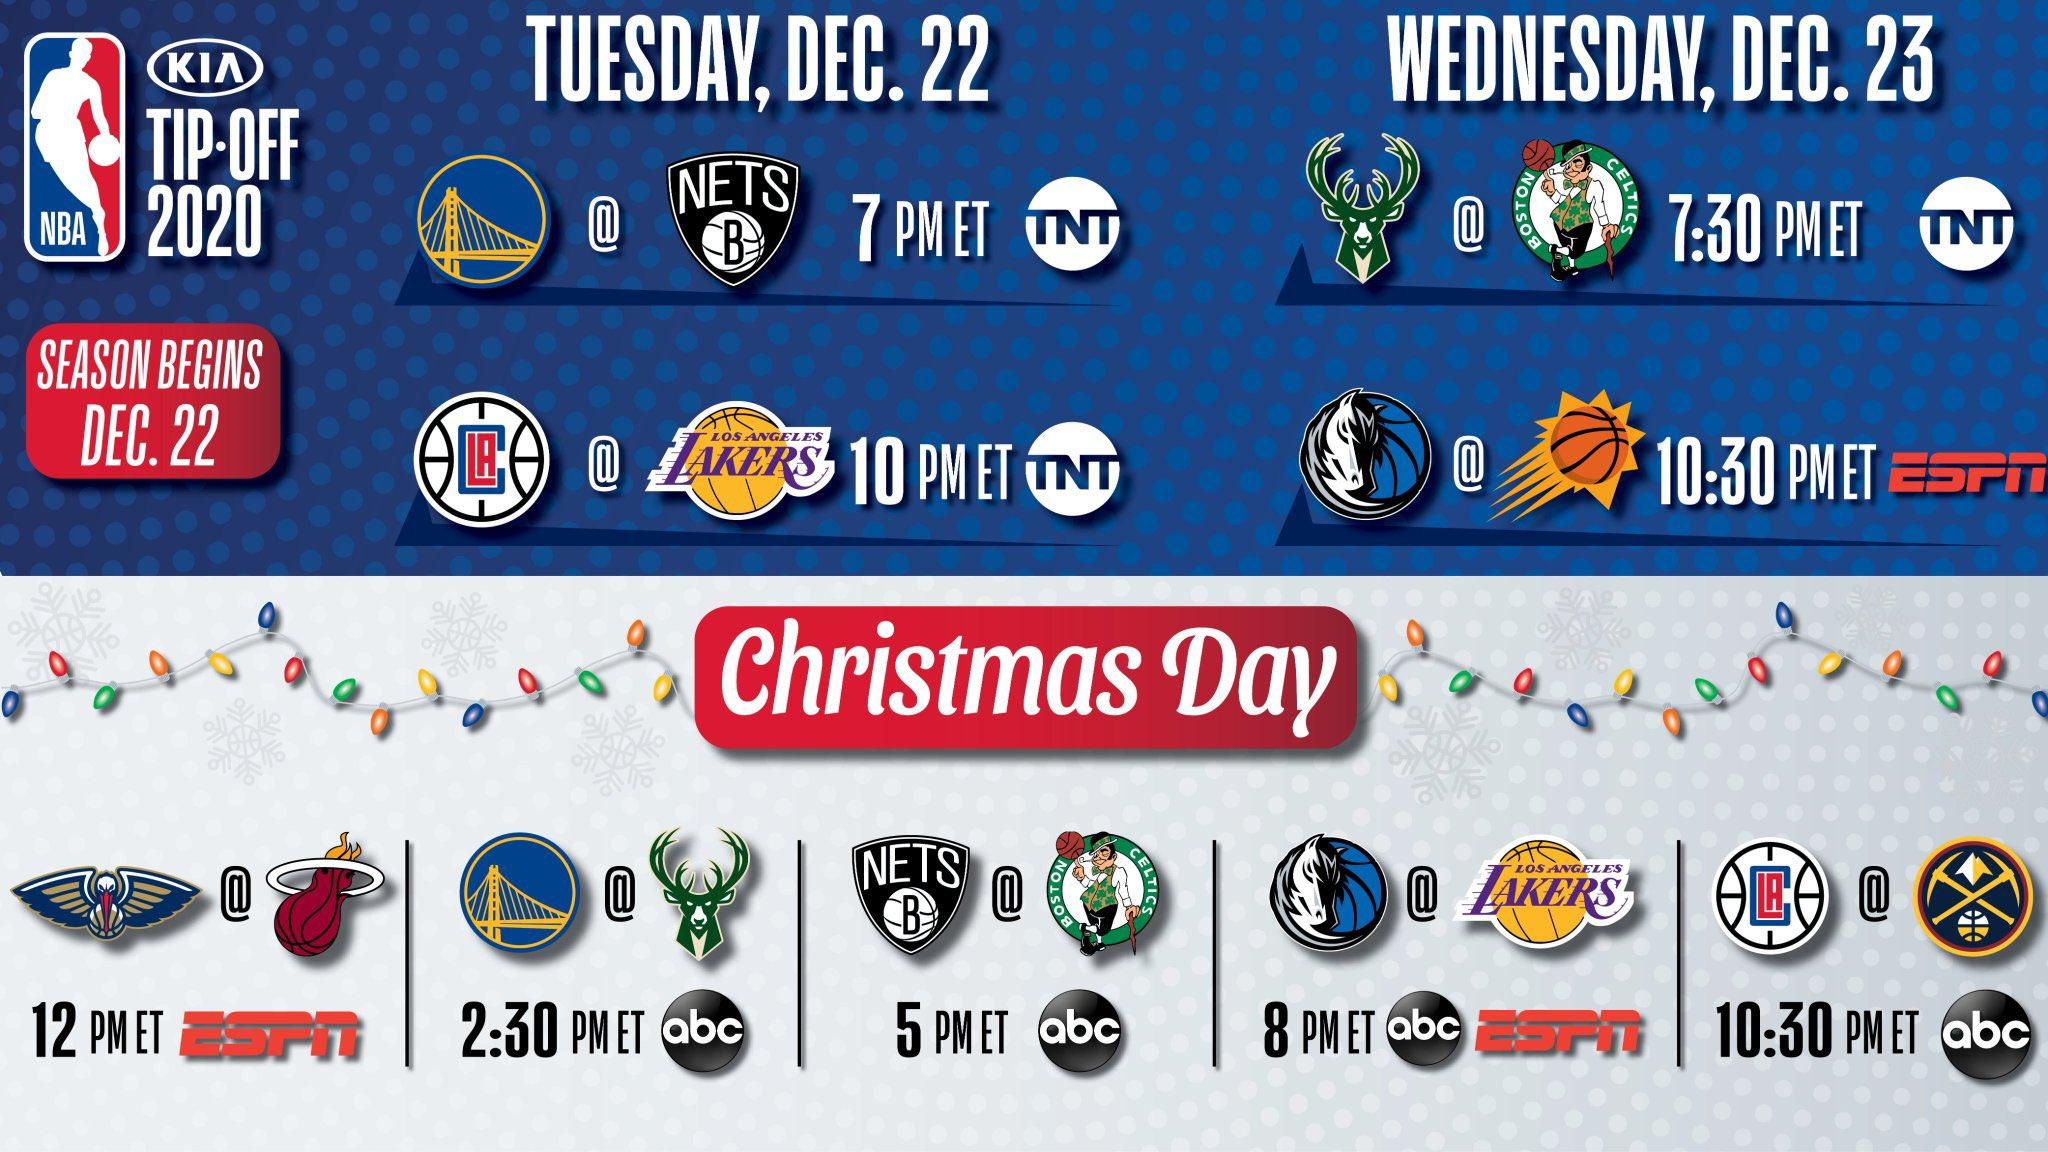 NBA公布部分全国直播赛程:绿军战雄鹿,太阳对阵独行侠